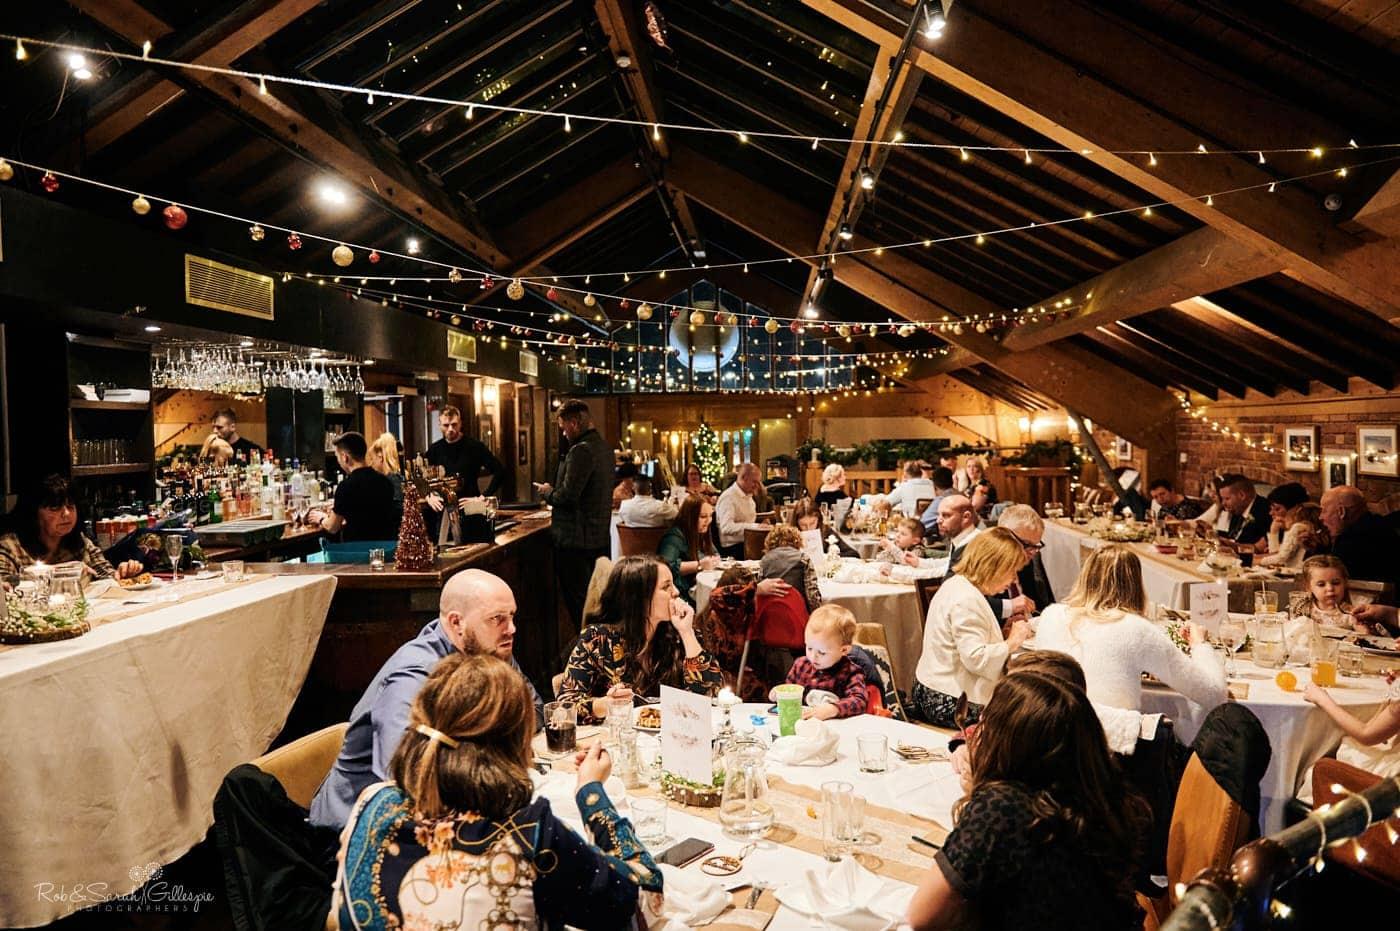 Wedding reception at Cox's Yard in Stratford-upon-Avon